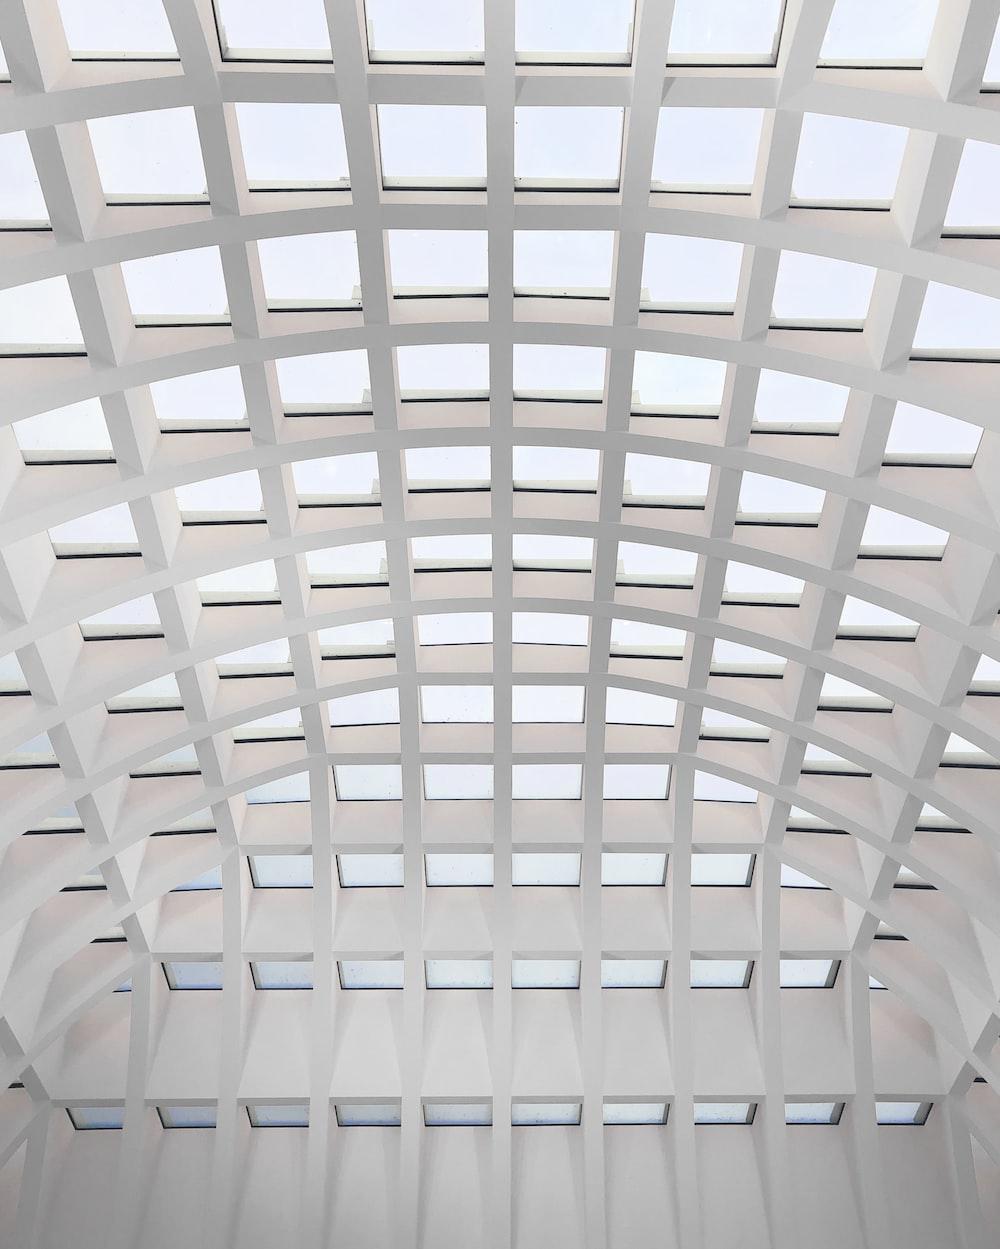 white metal frame ceiling during daytime